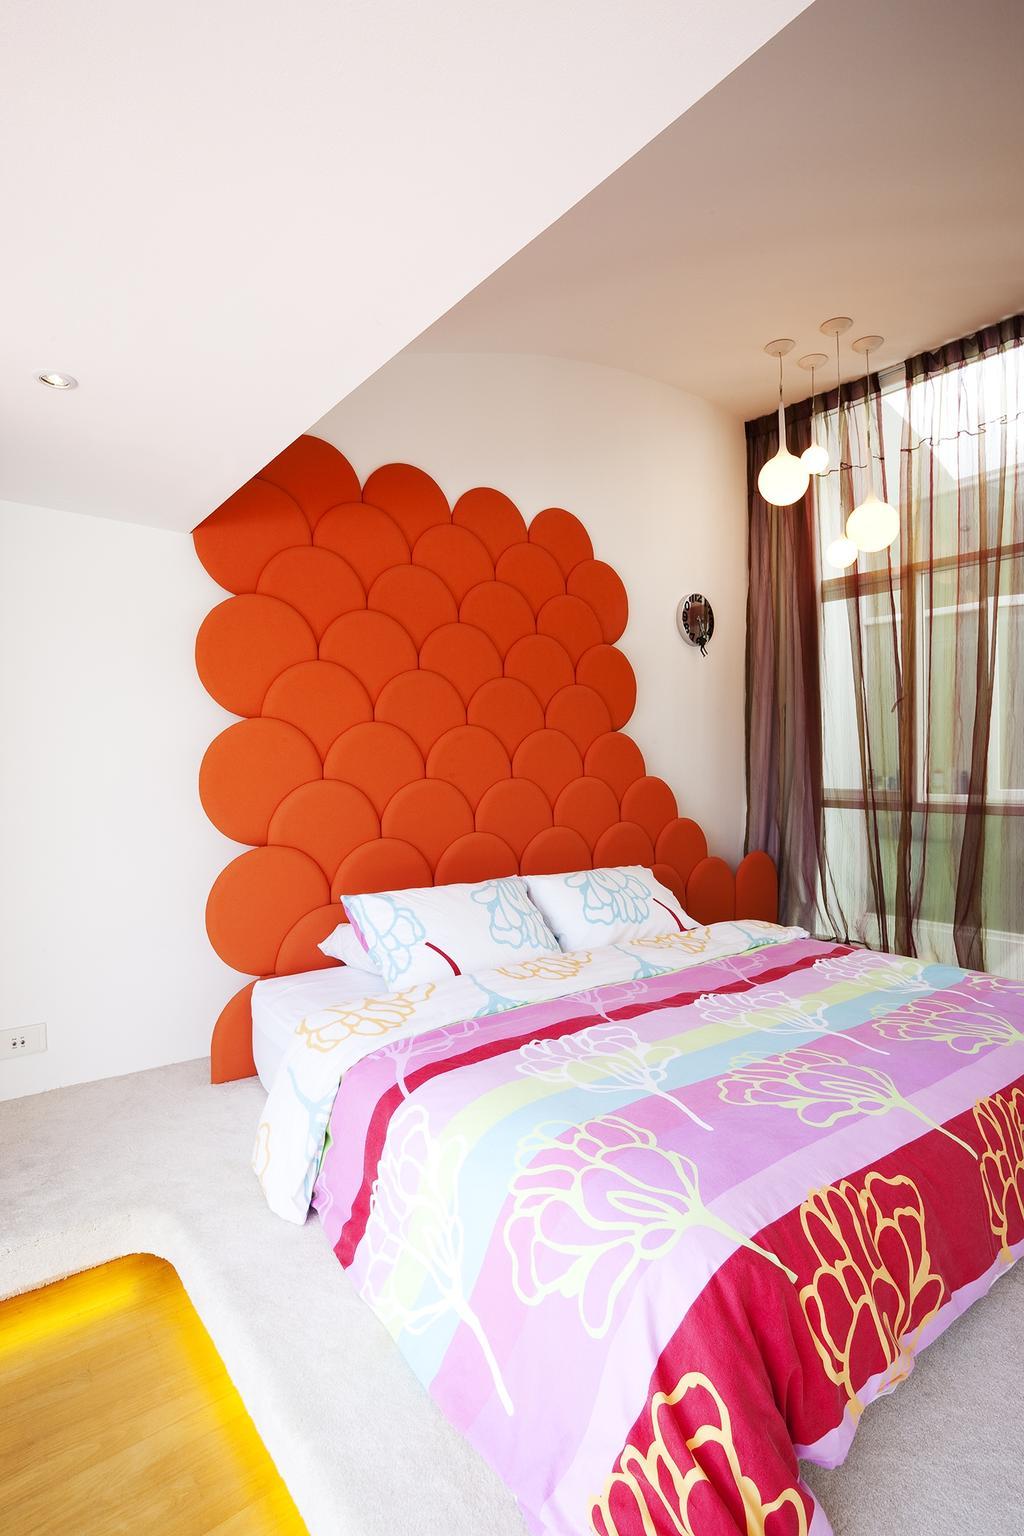 Retro, Landed, Bedroom, Lichi Avenue, Interior Designer, Free Space Intent, Headboard, Concealed Light, Hanging Light, Curtain